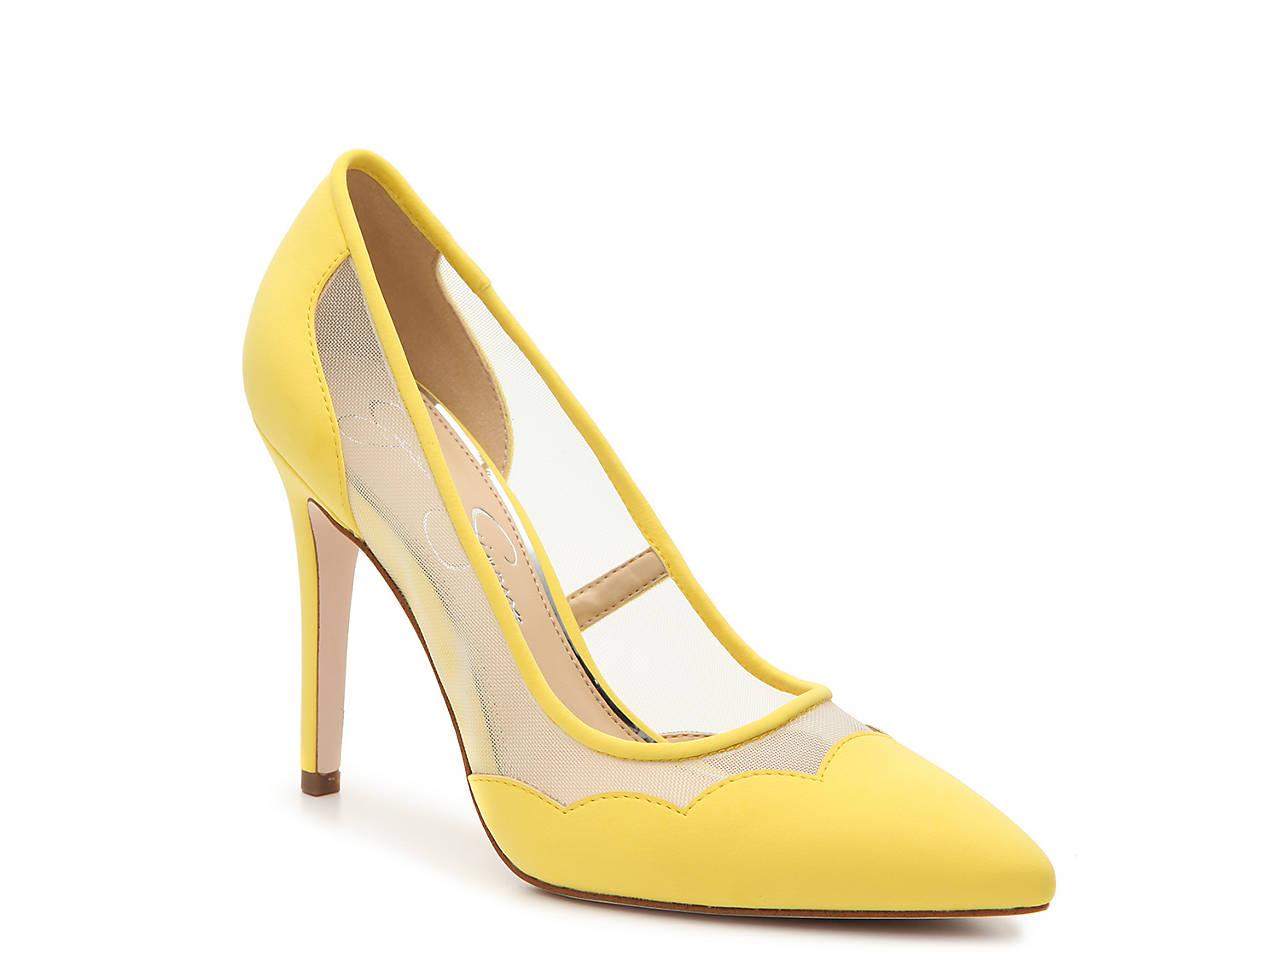 eaf47b61d6c6 Jessica Simpson Pescanta Pump Women s Shoes